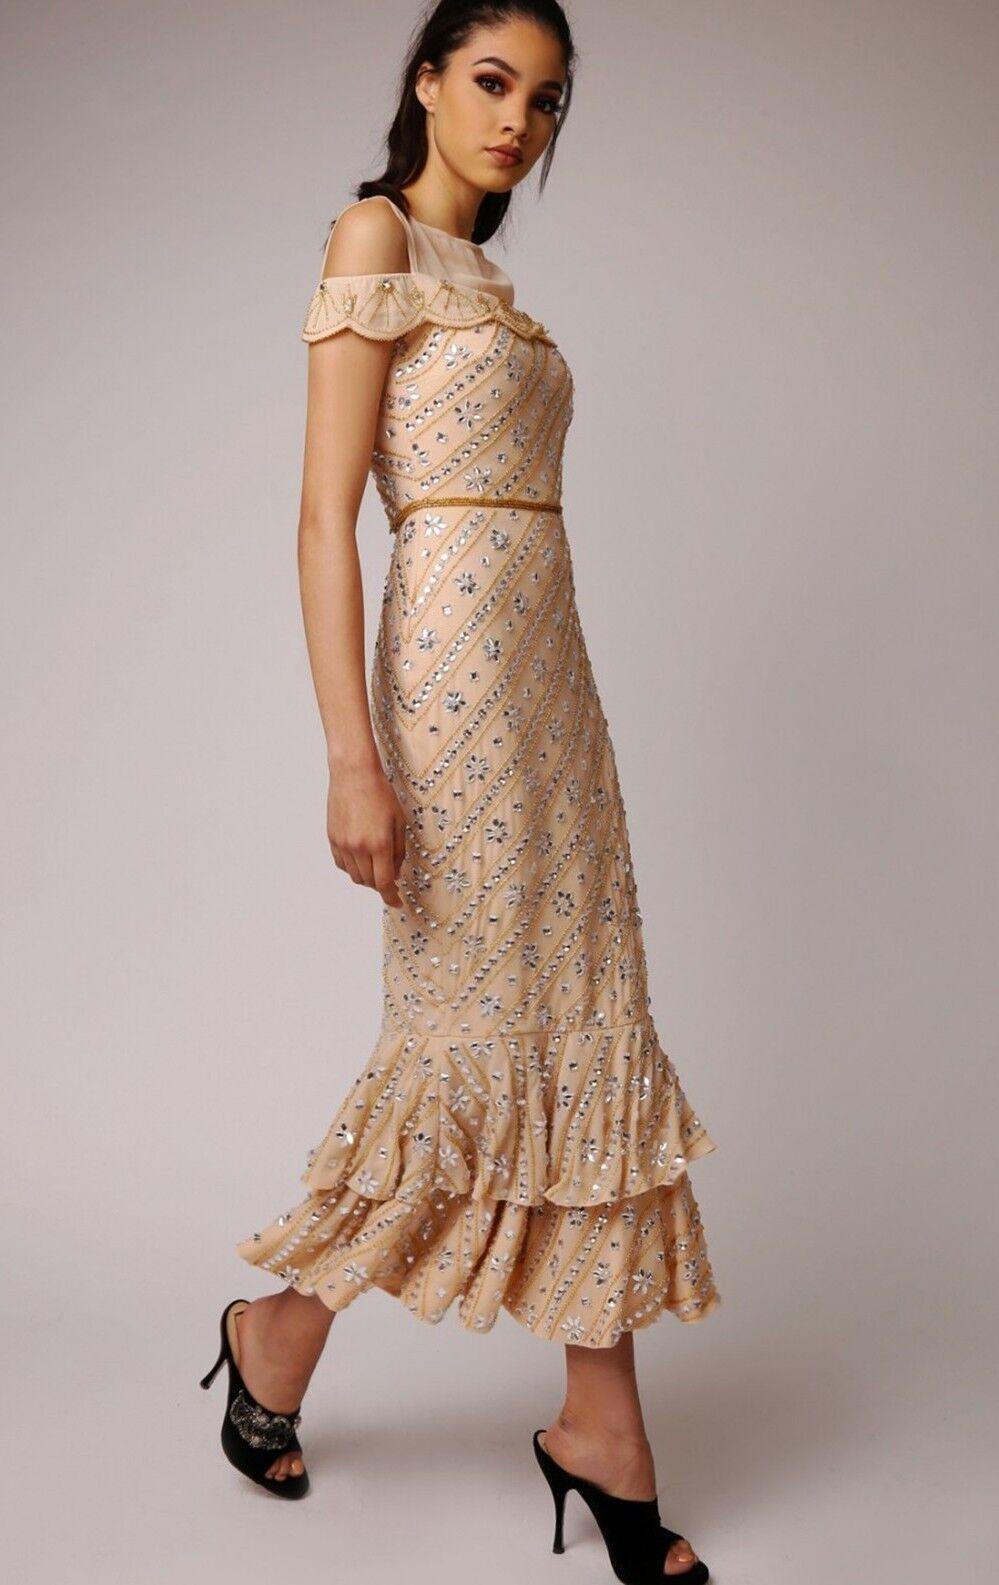 Dress 10 BNWT Virgos Lounge Embellished Nude Wedding Bridesmaids Prom ASOS